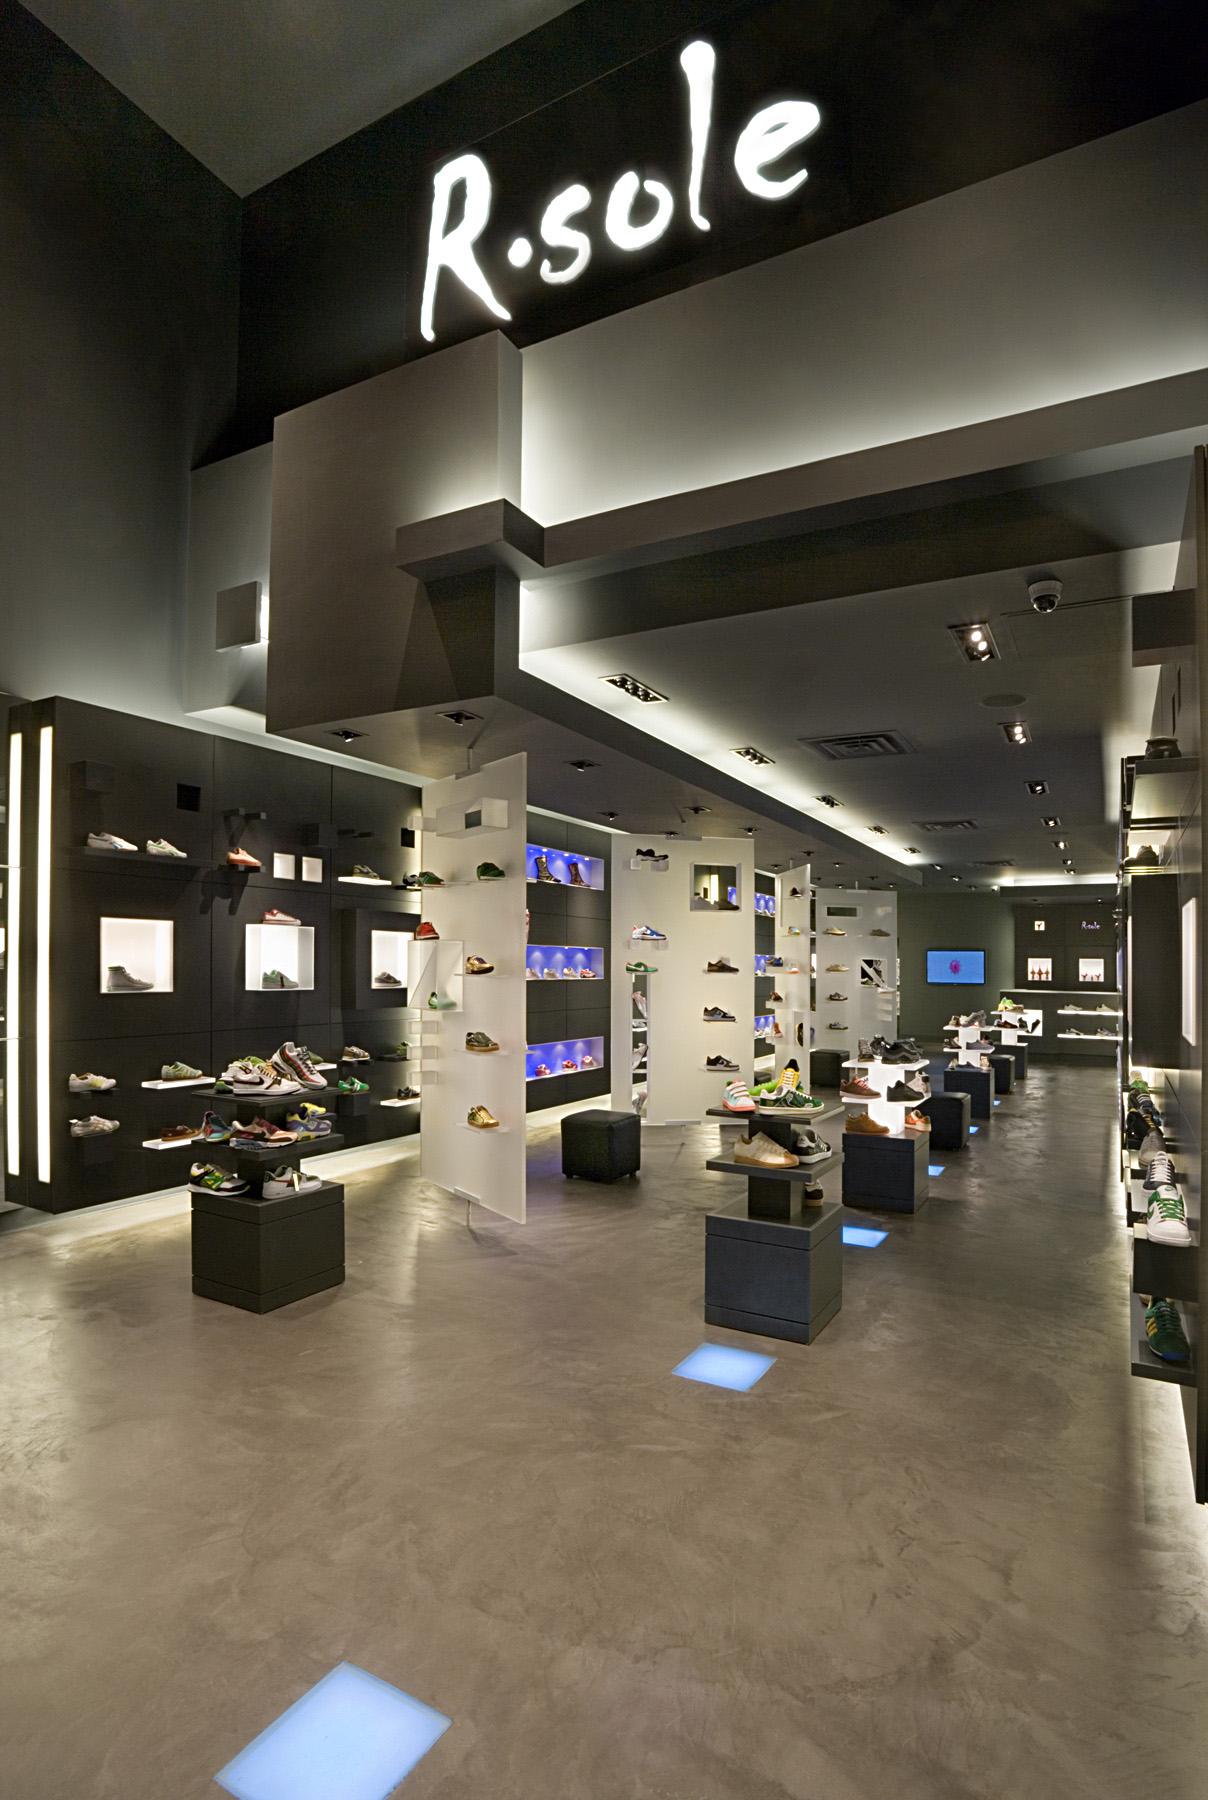 R. Sole. Tobin Parnes Design. Retail Design. Entry. Movable Display.